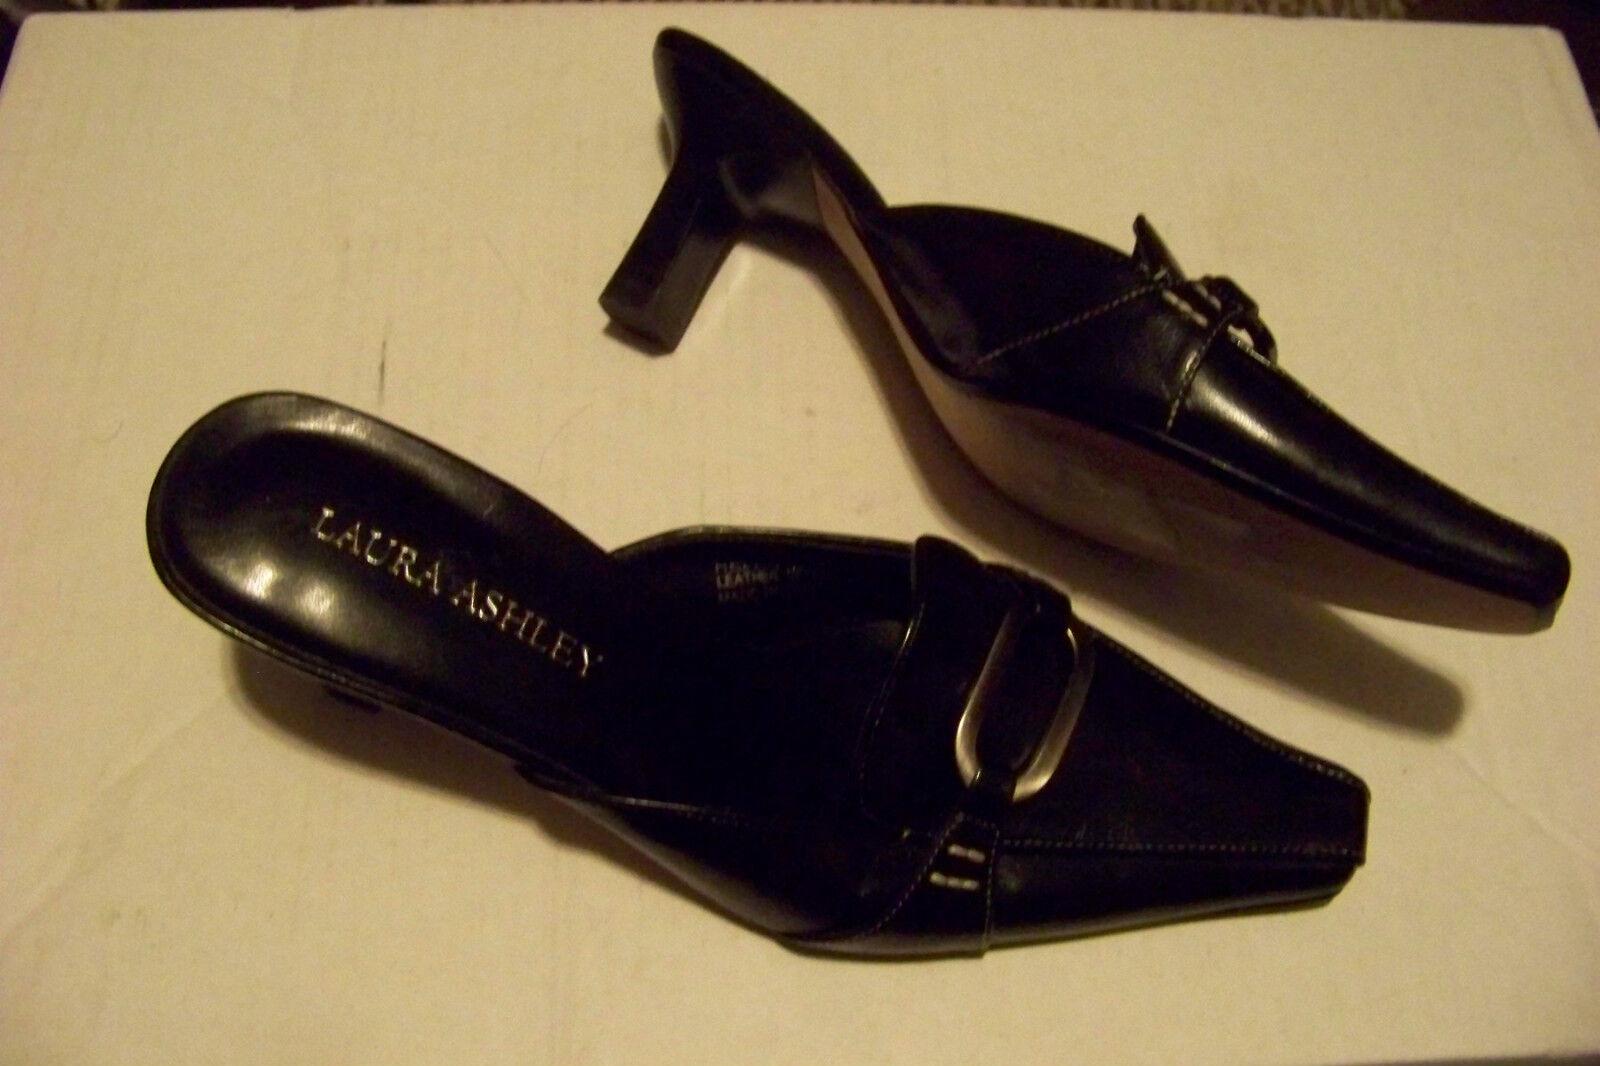 womens laura ahsley helena black toe leather slip on square toe black heels shoes size 6.5 4a9859